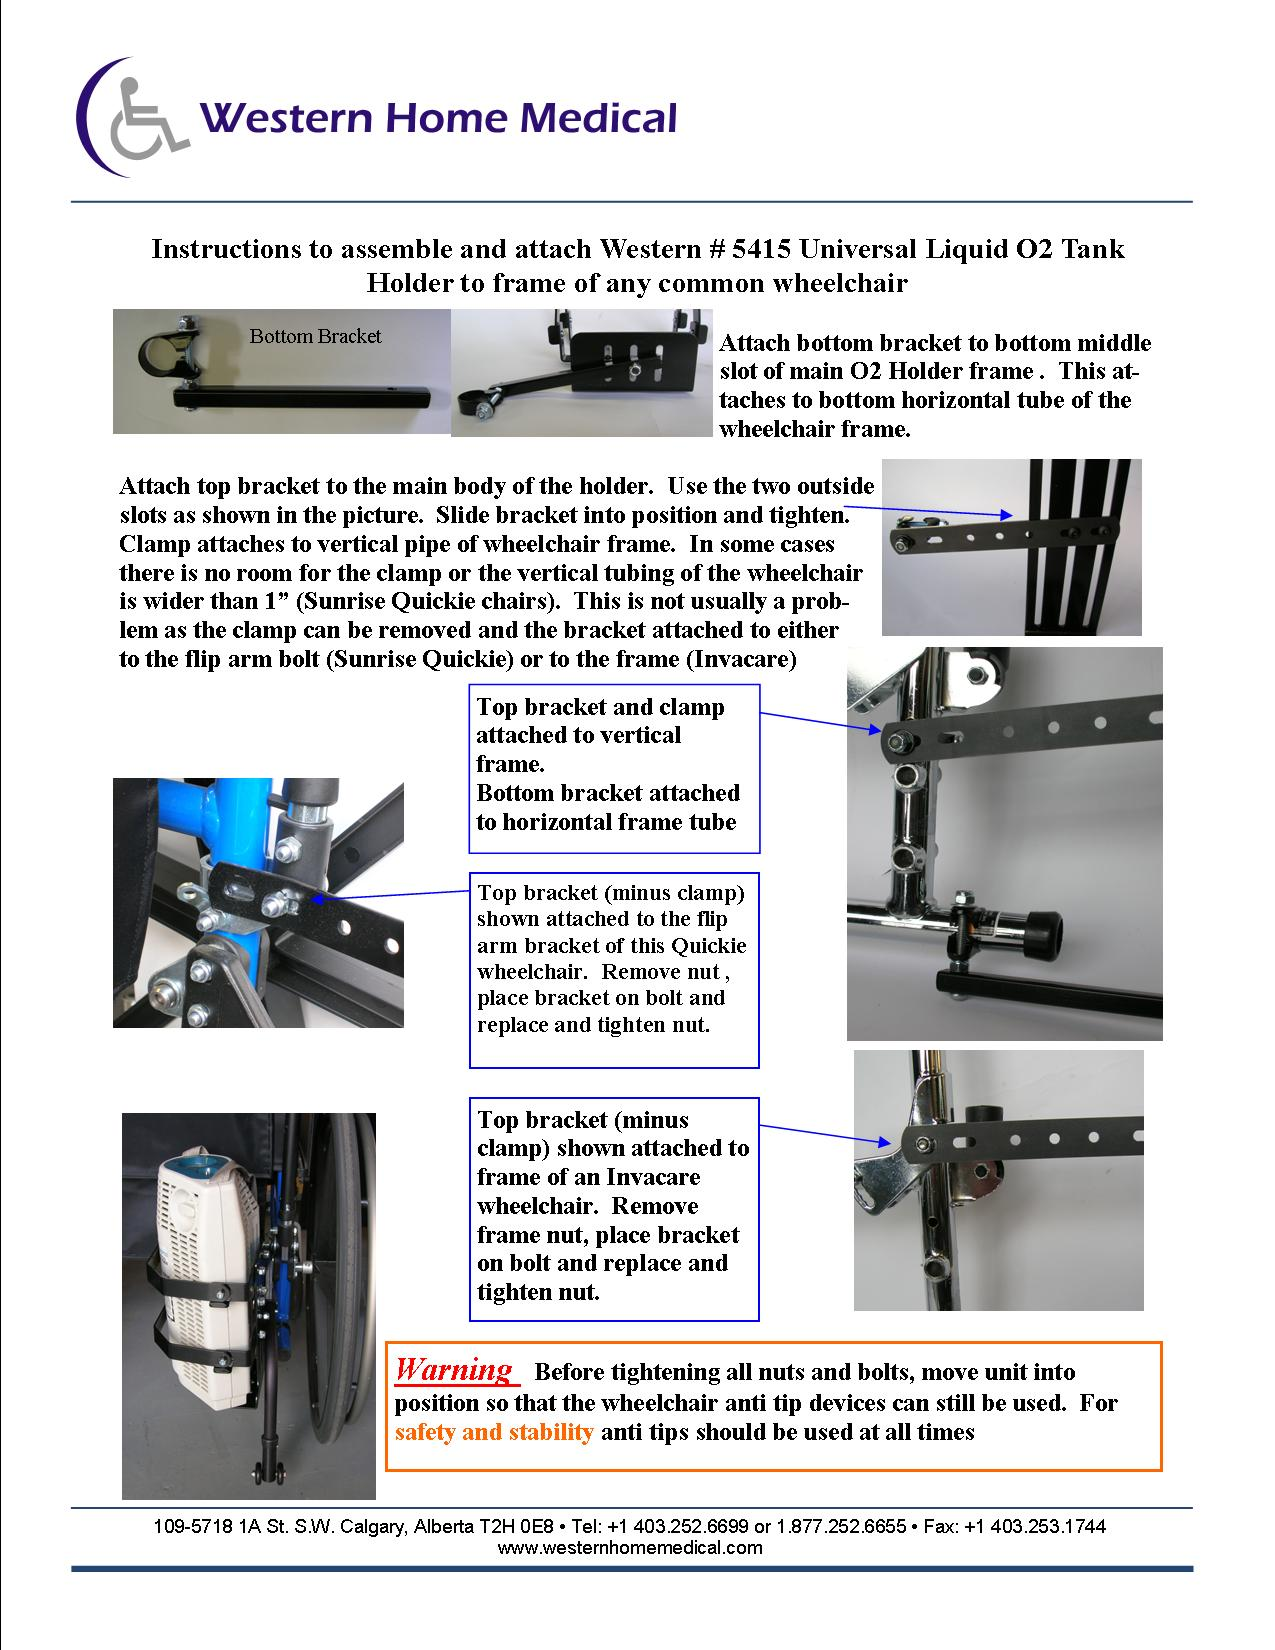 Liquid O2 Instructions